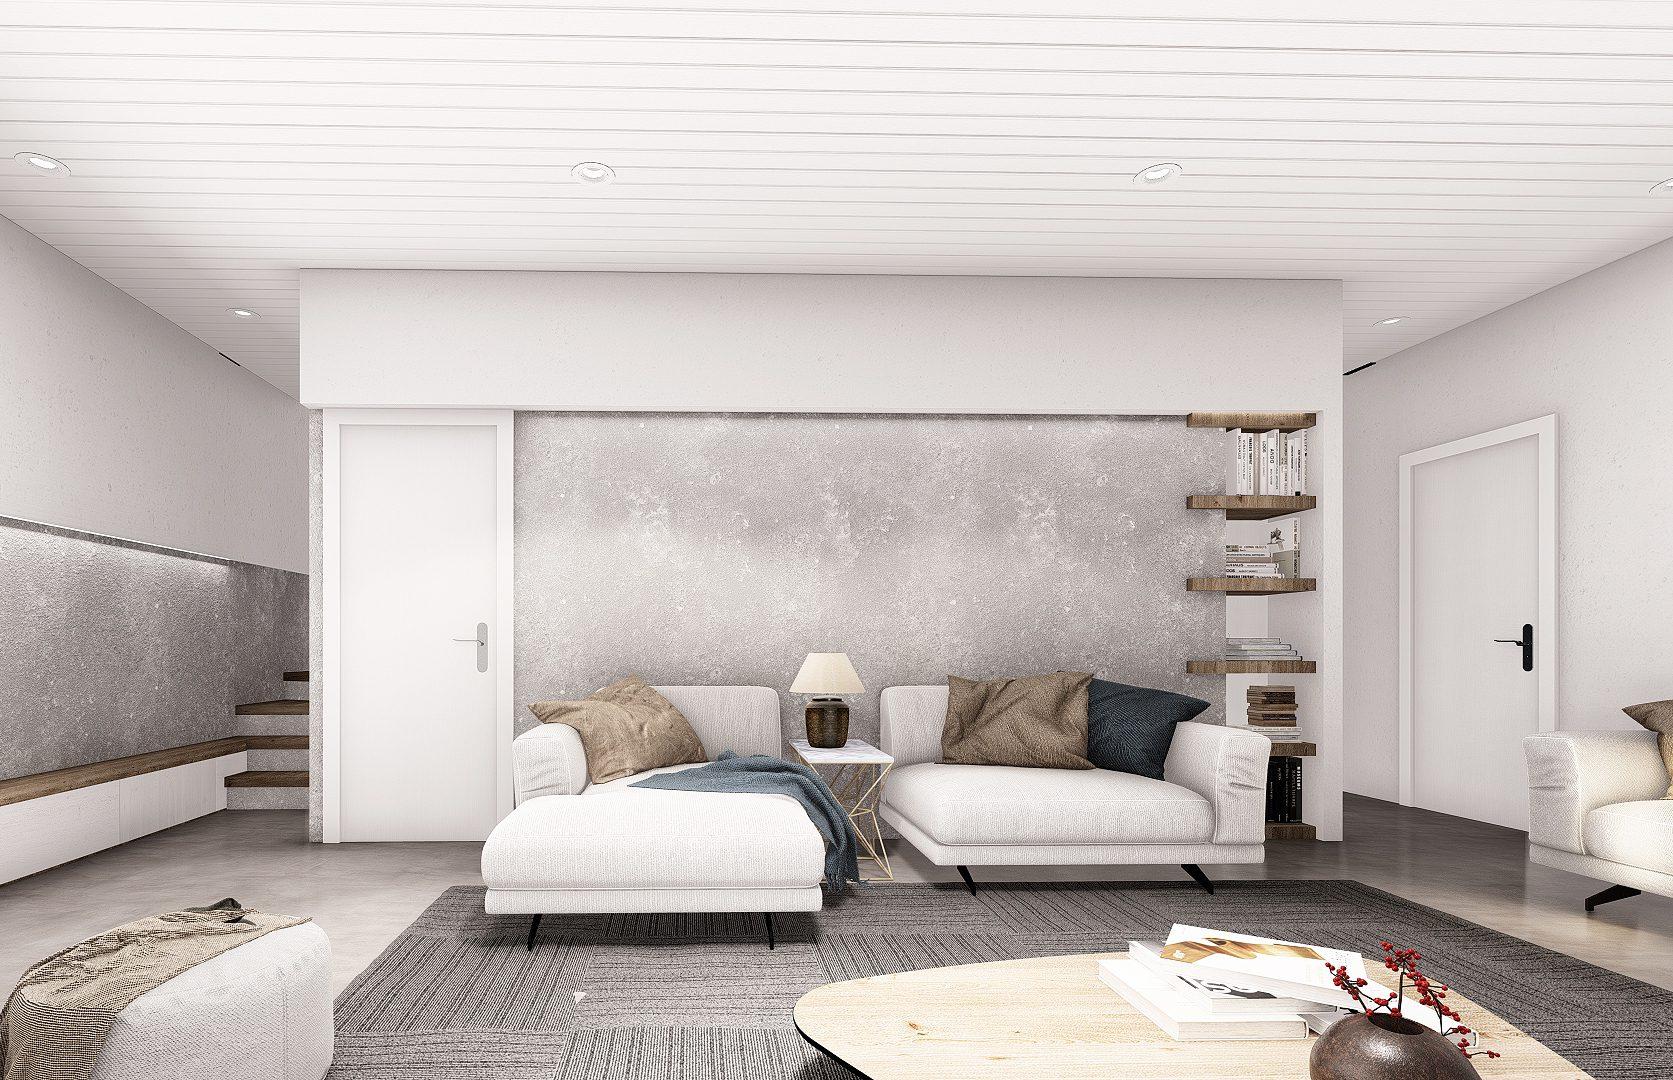 Normerica Timber Frames, House Plan, The Laurentian, Interior, Basement 1